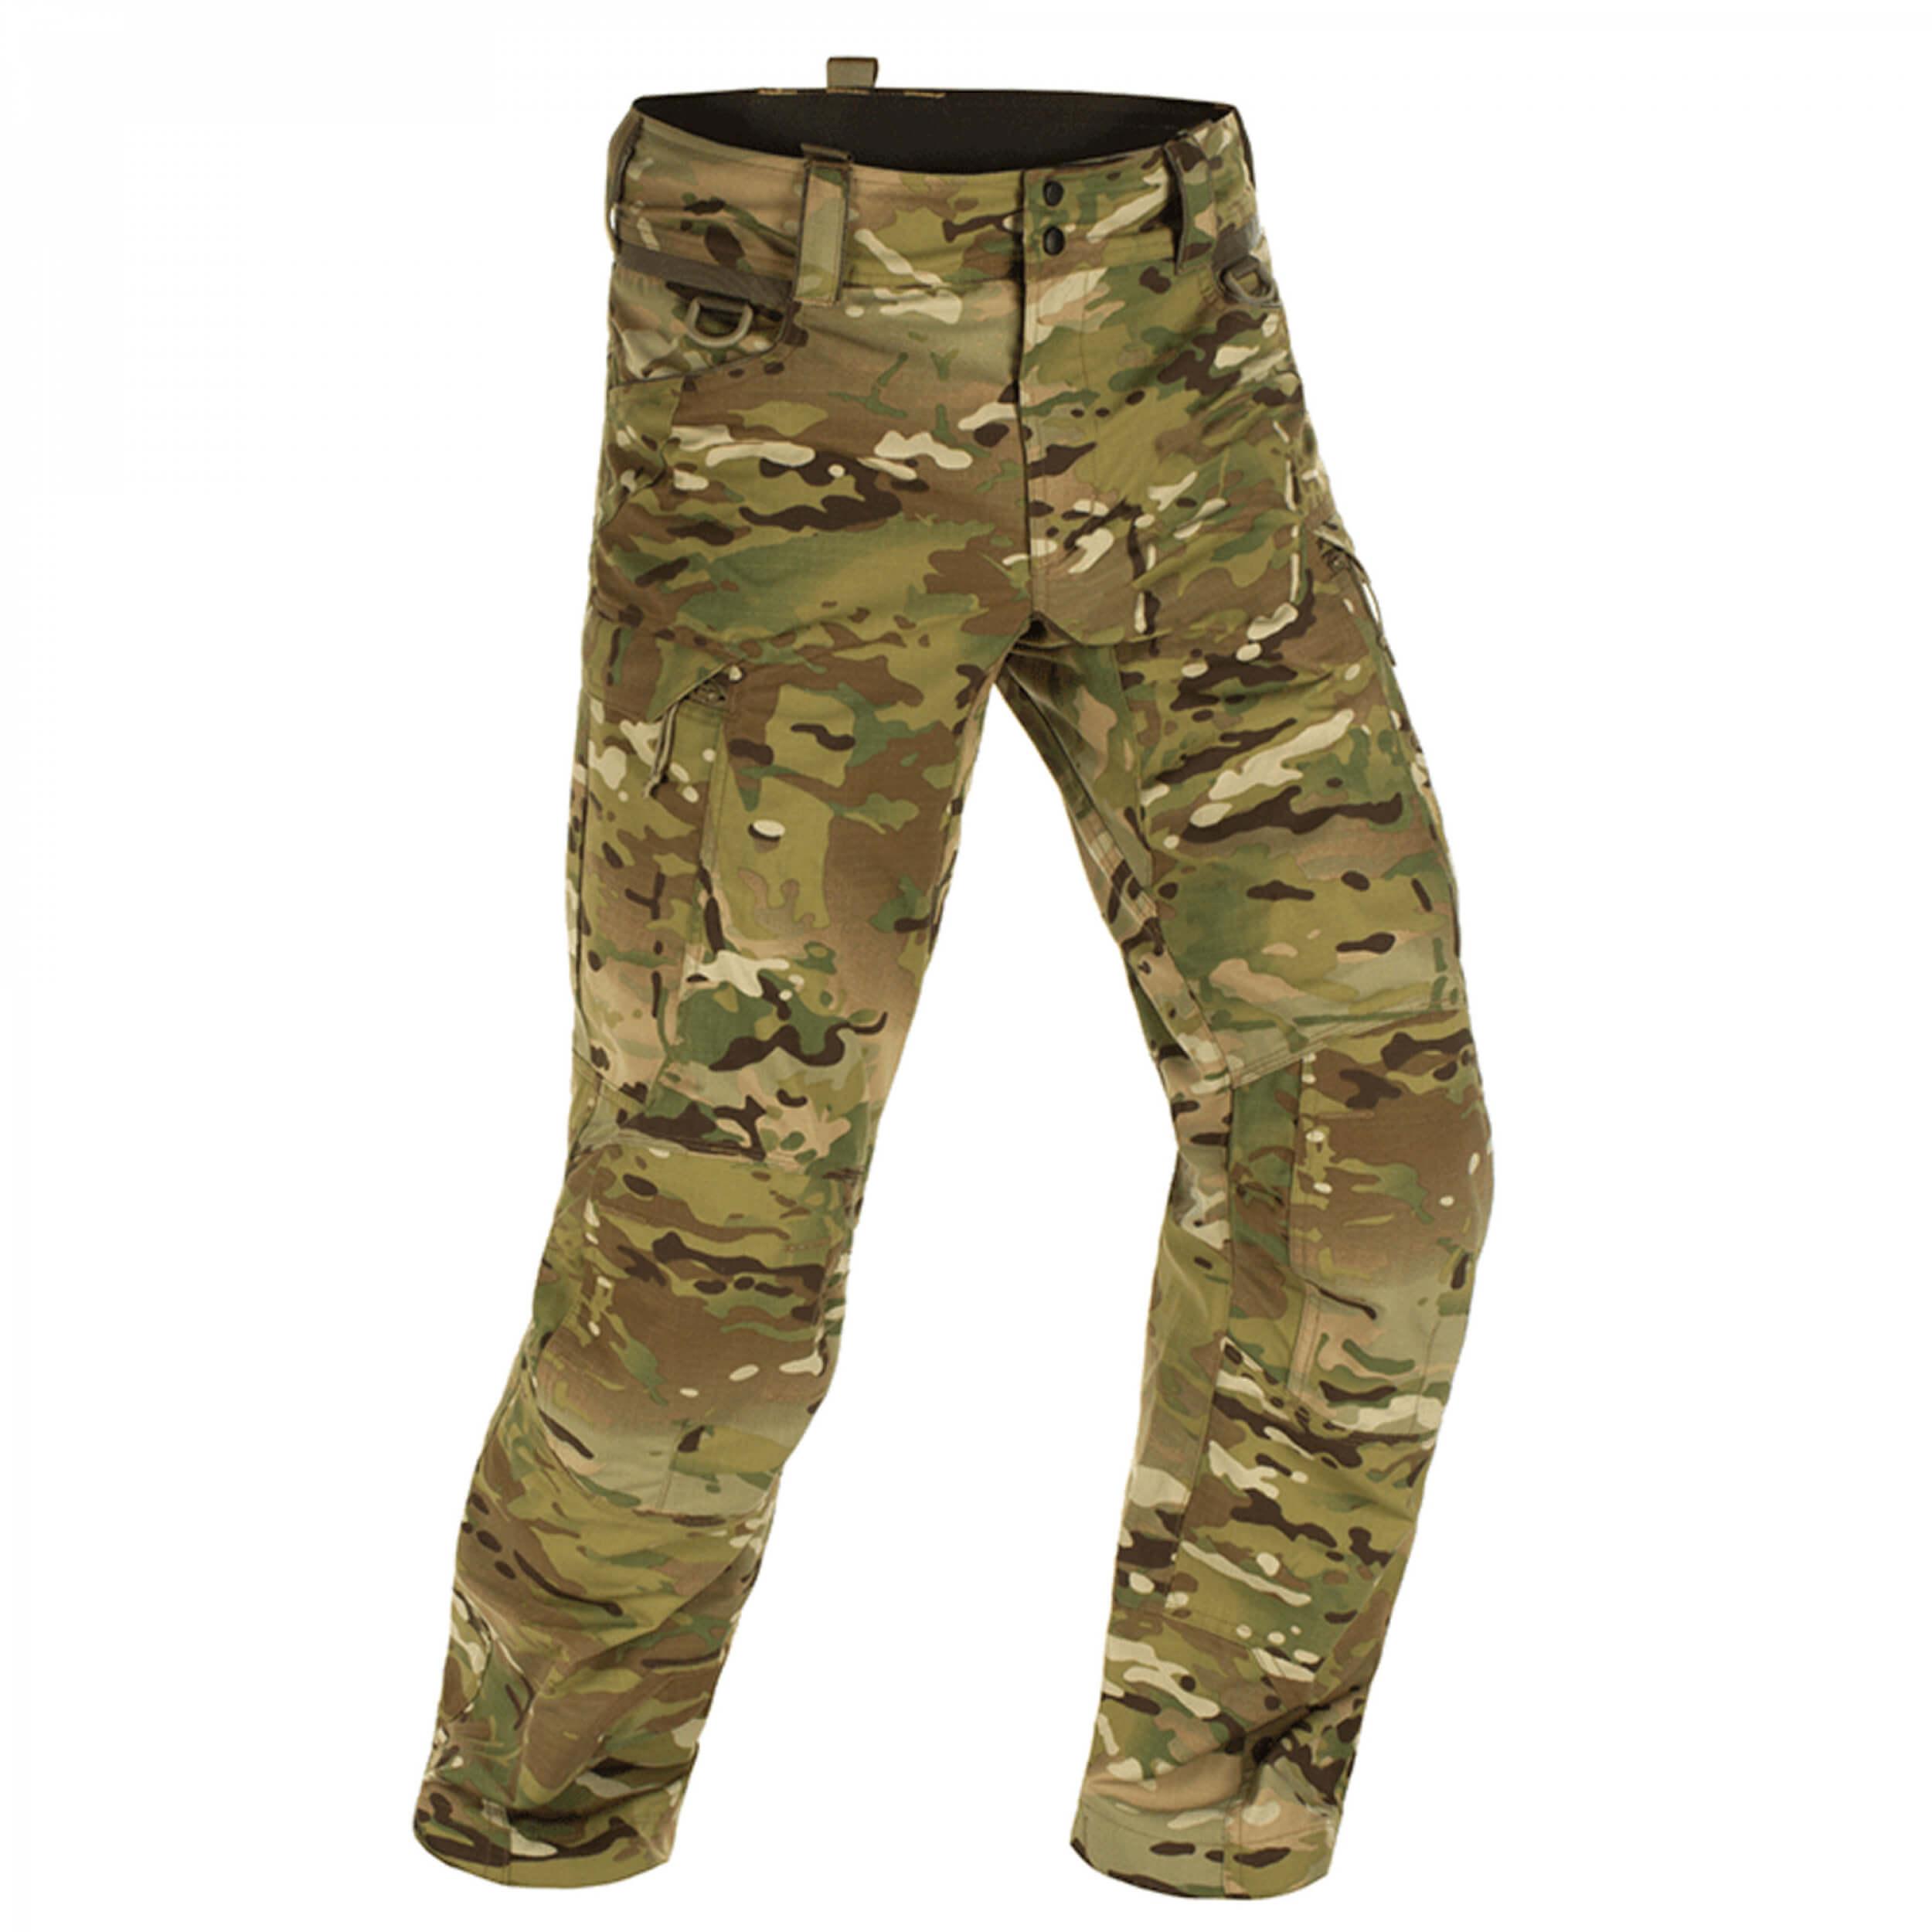 Clawgear Operator Combat Pant Multicam 40/32